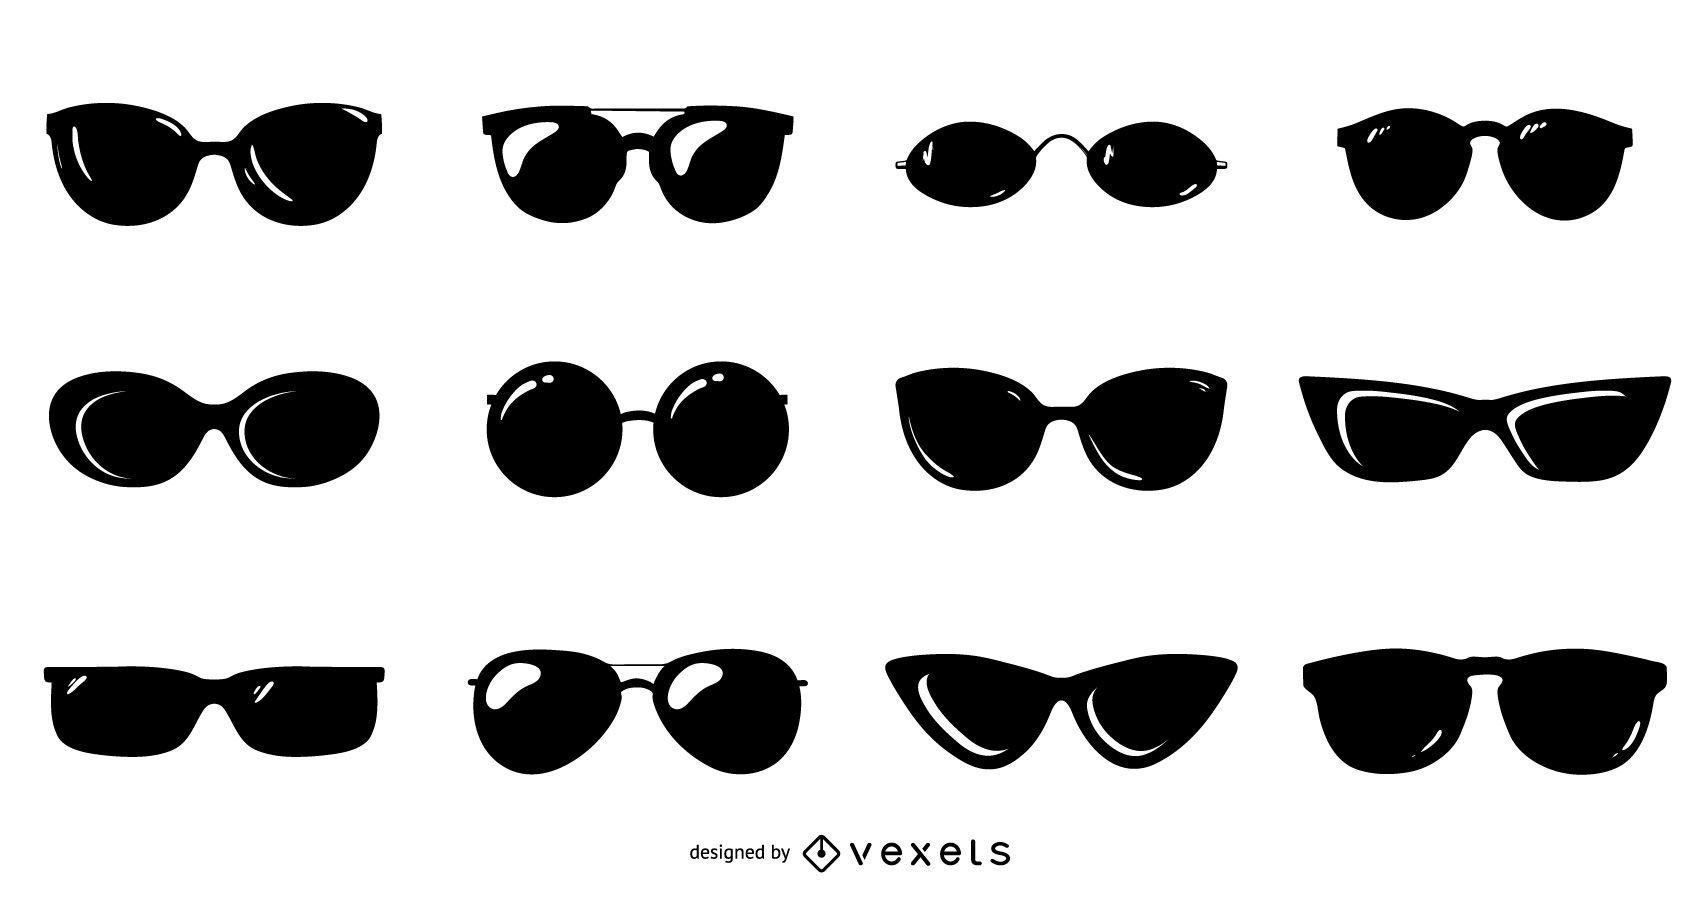 Sunglasses Silhouette Design Pack